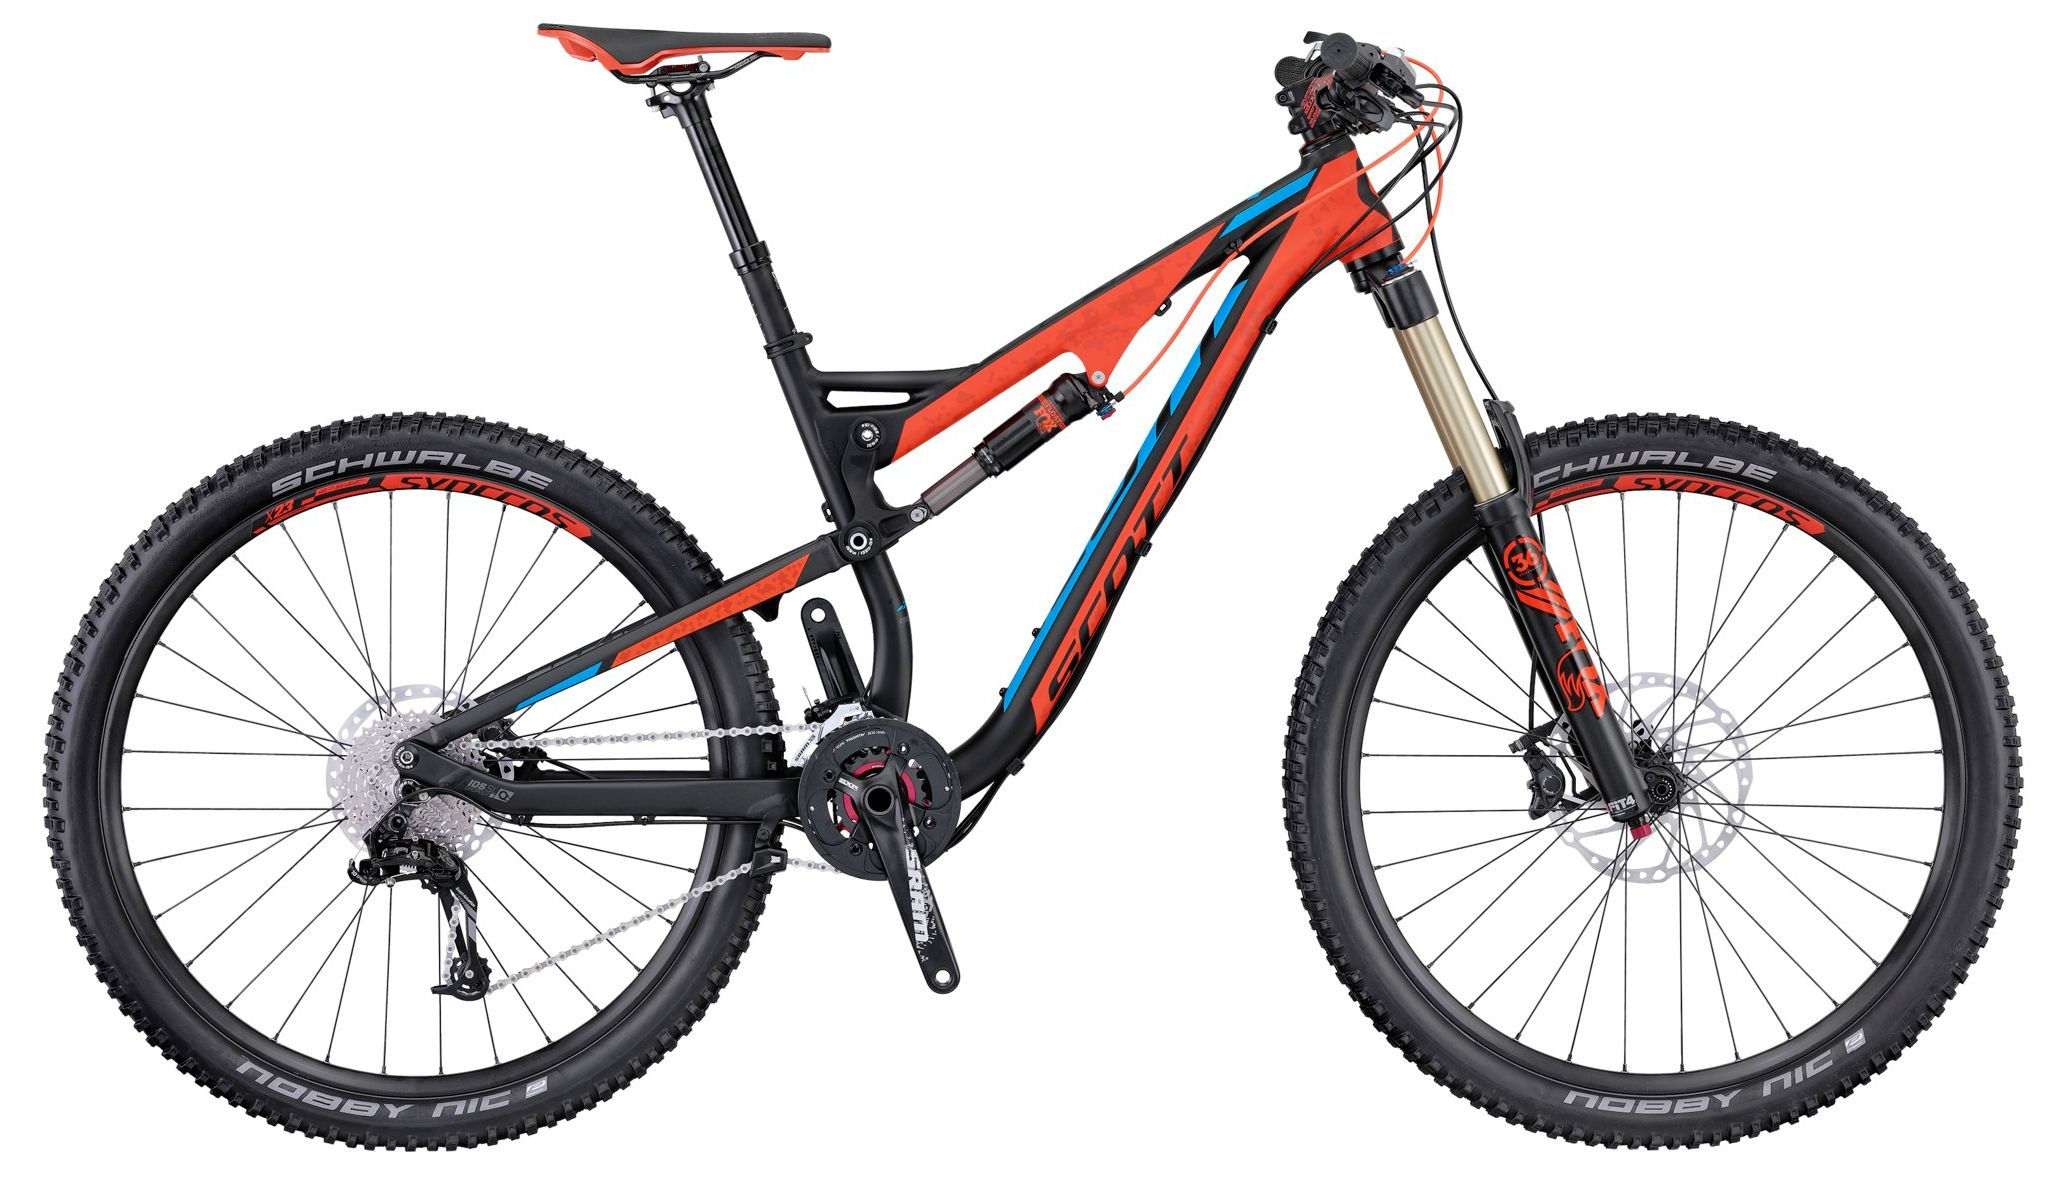 Велосипед Scott Genius LT 720 2016 велосипед scott genius lt 700 tuned plus 2016